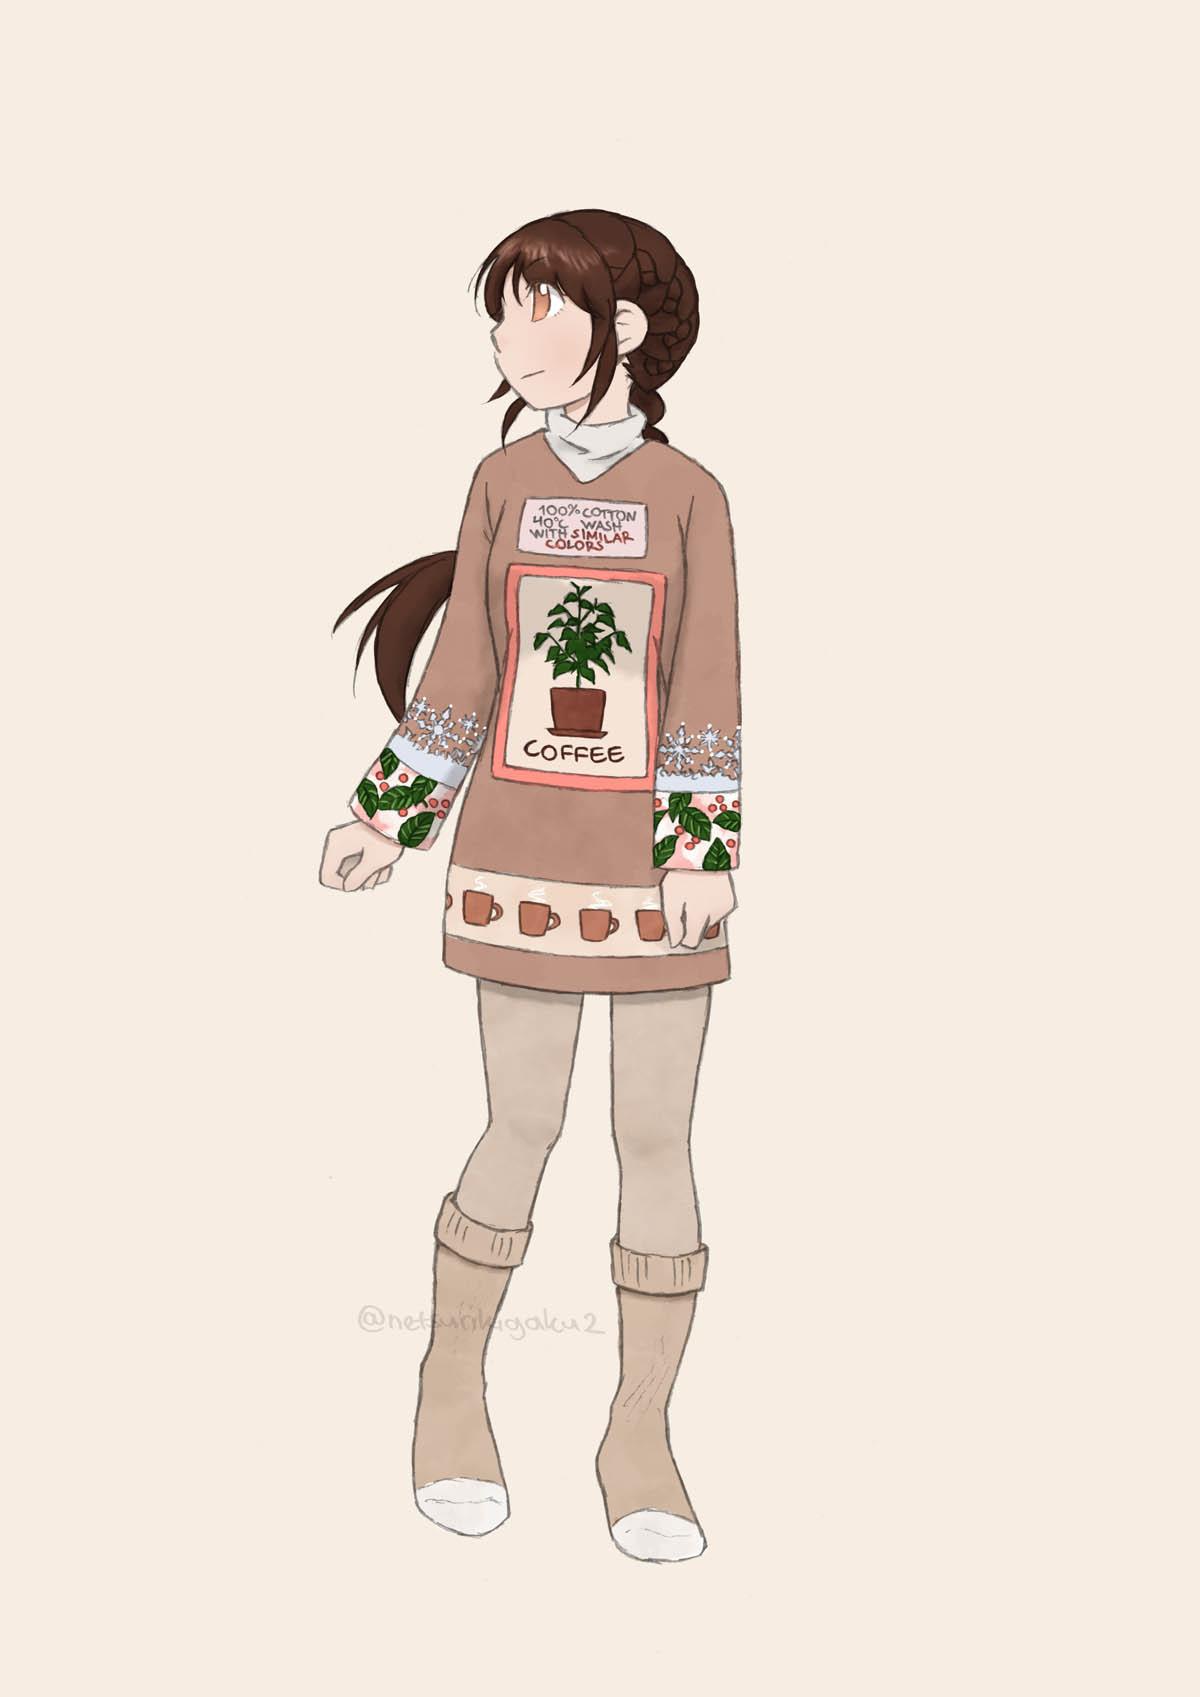 Hiura wearing a tunic with print